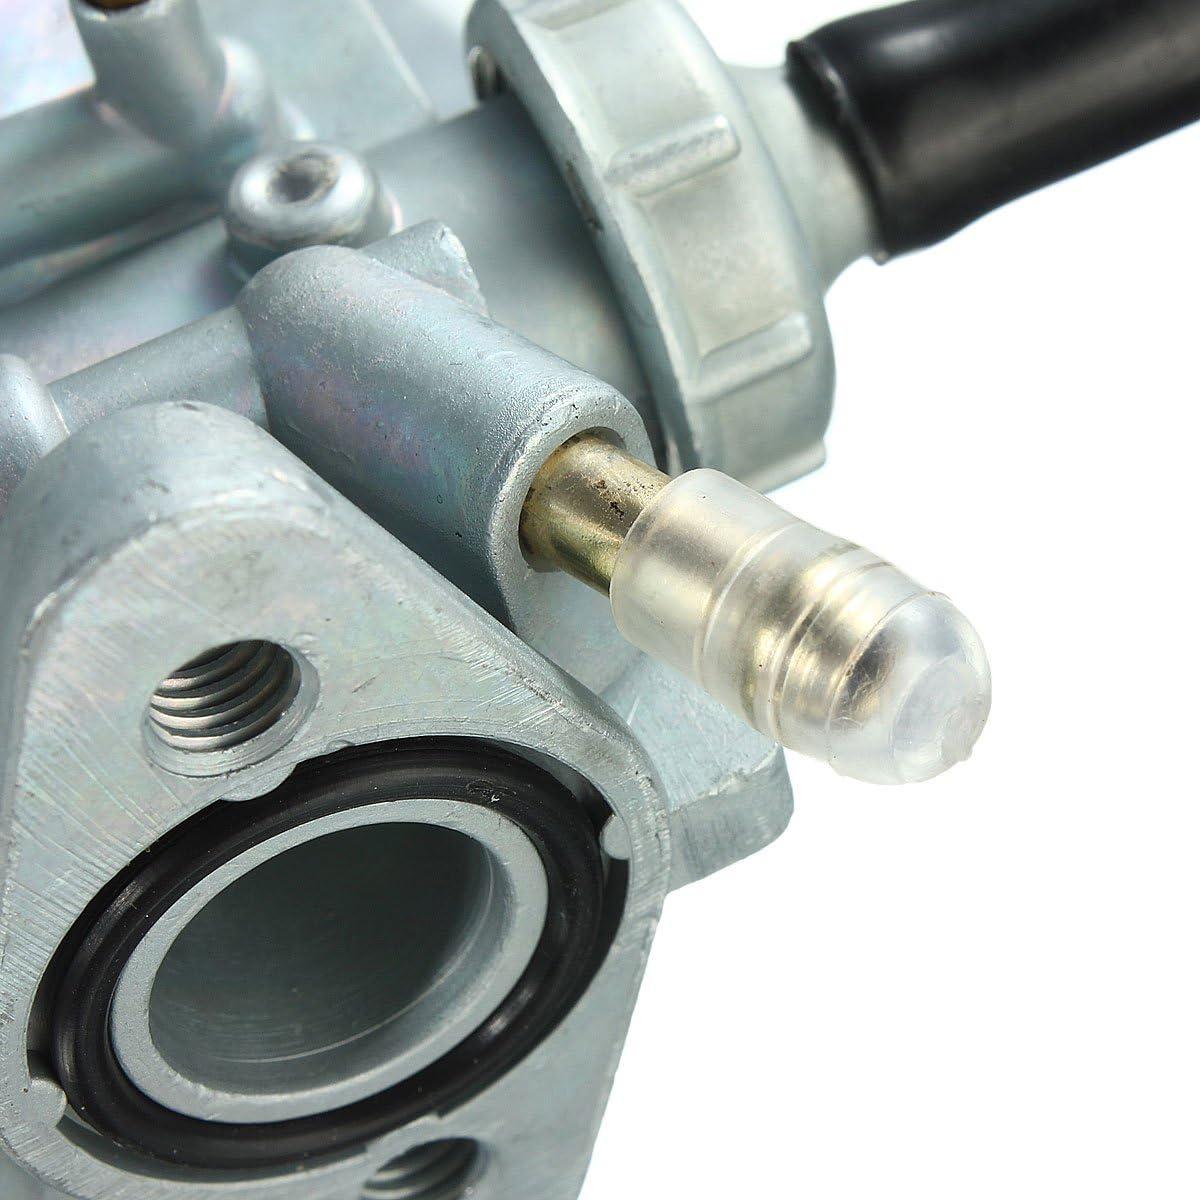 Carburetor For Honda Crf50 Filter Moto Auto 110Cc Crf50F Crf 50 70 Xr50 Crf80 Crf80F 88CC Taotao 2004 2009 Scooter Carb